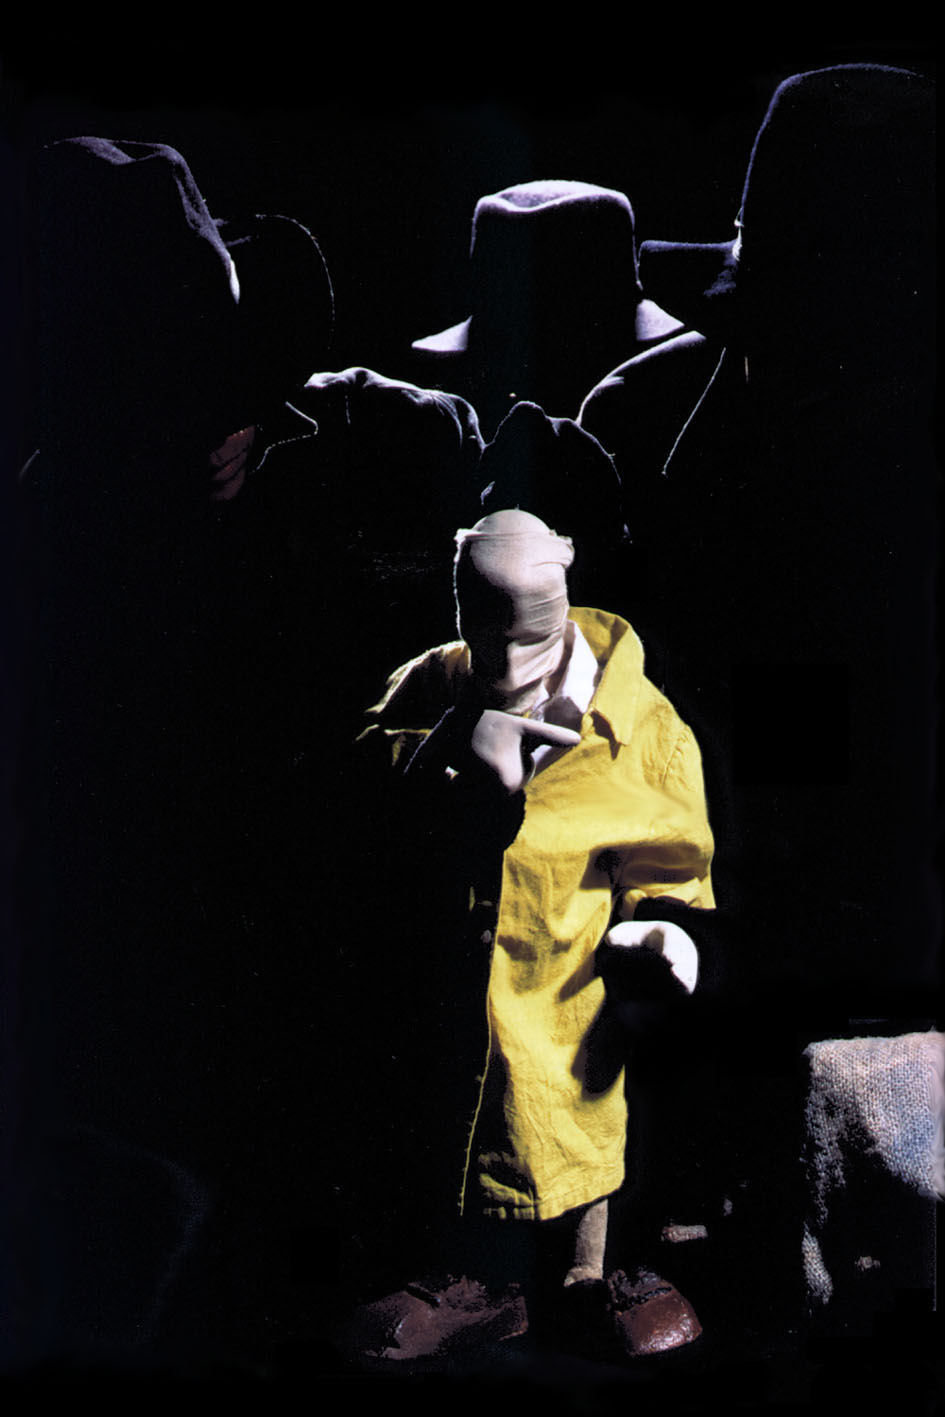 Miguel Vellinho, Luiz André Cherubini et Sandra Vargas dans <em>Beckett</em> (1992) de Samuel <em>Beckett</em> par le Grupo Sobrevento (São Paulo, Brésil), mise en scène : Luiz André Cherubini, conception : Grupo Sobrevento. Collection : Grupo Sobrevento. Photo: Rodrigo Lopes